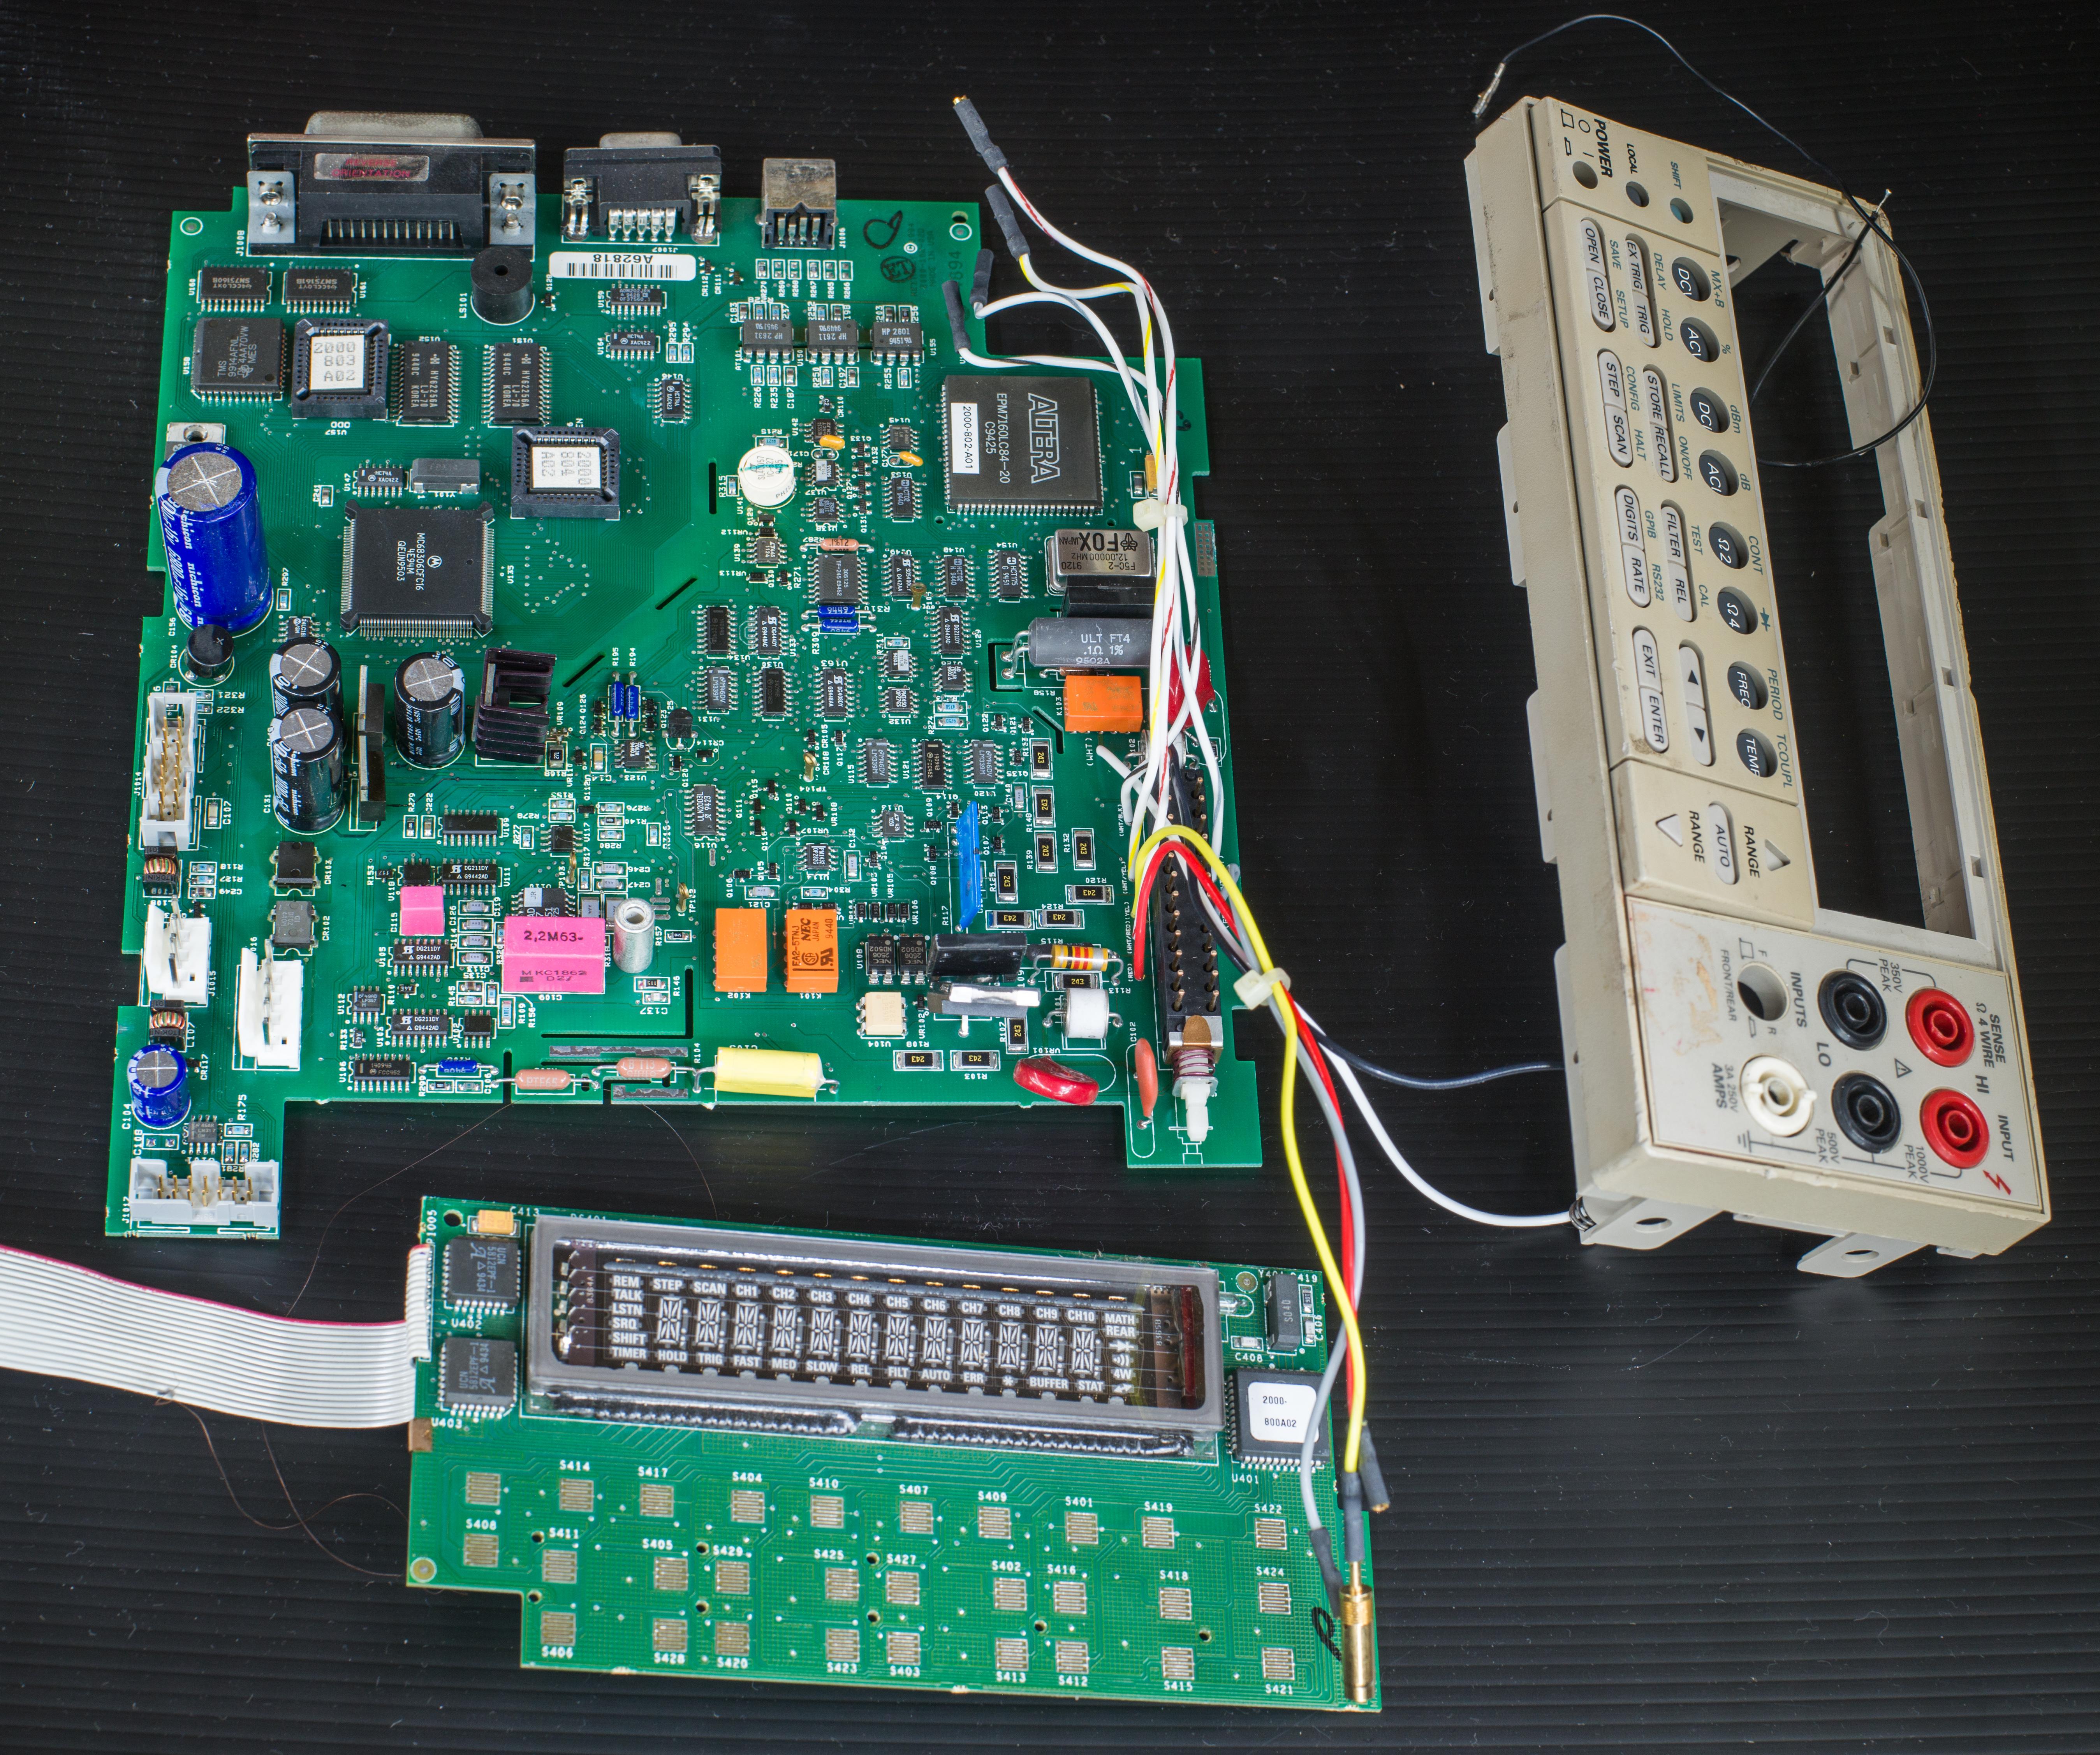 xdevs com keithley model 2000 dmm repair log rh xdevs com Keithley 2000 Multimeter Keithley 2000 Part Number